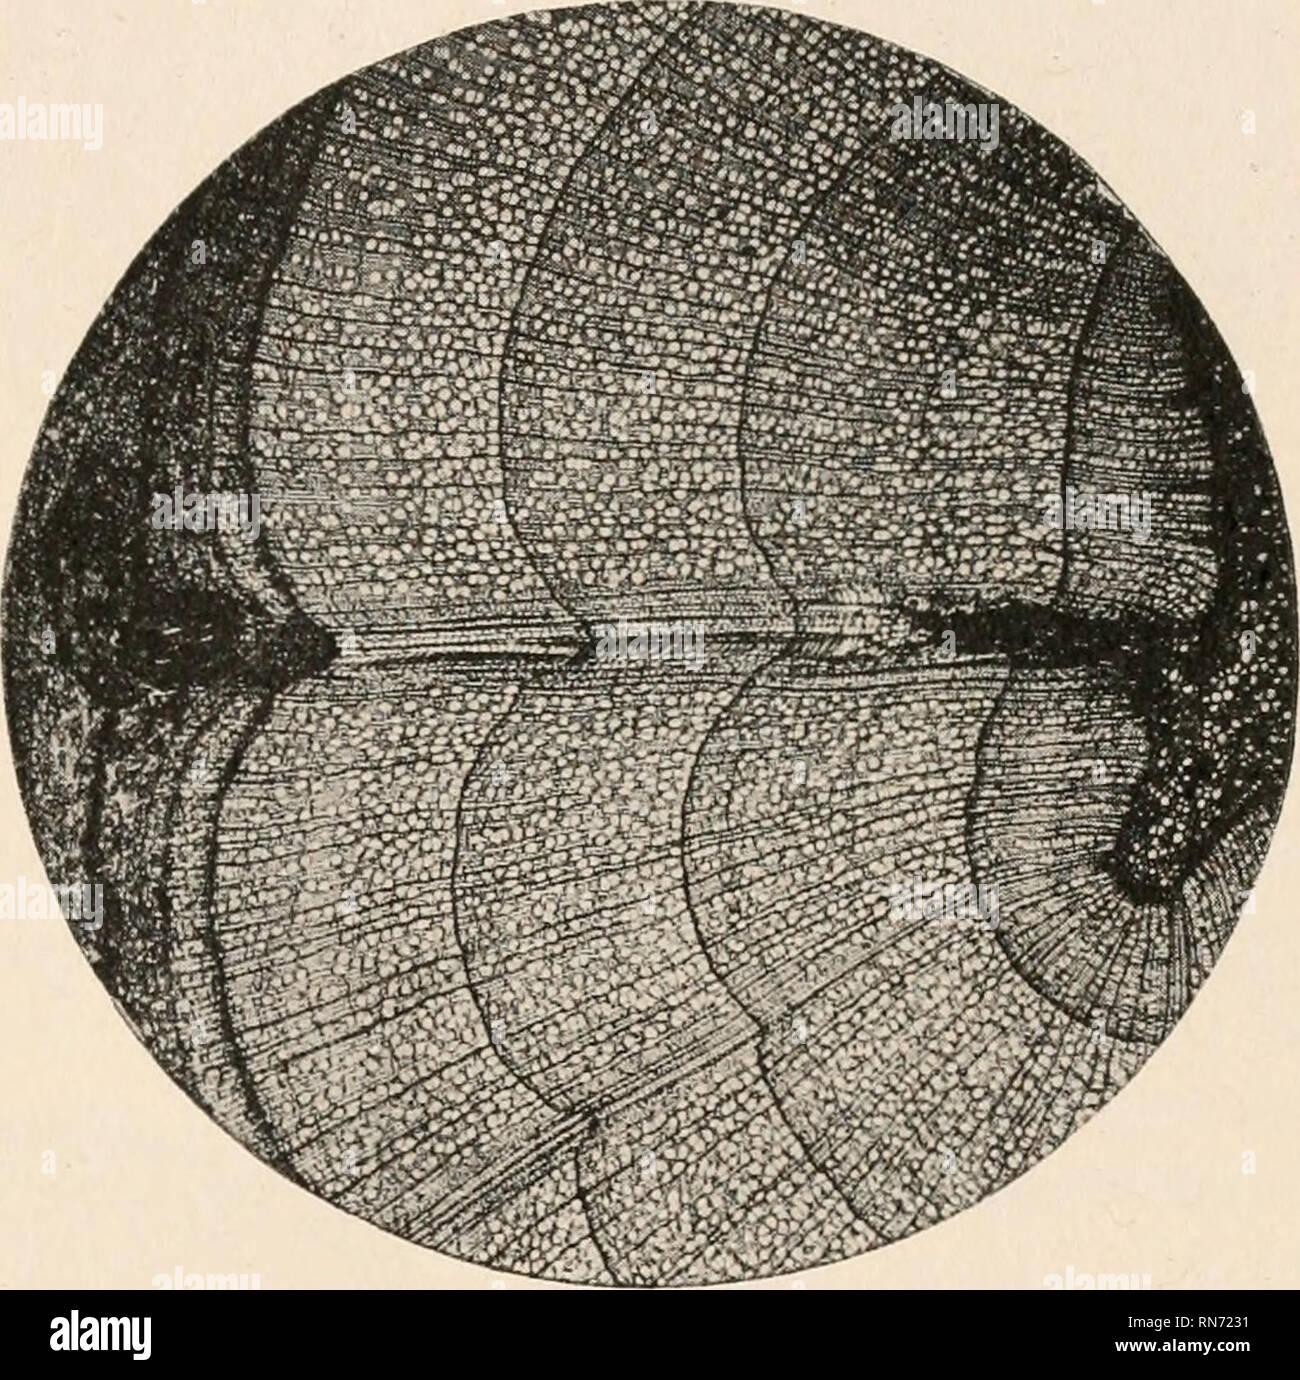 The Anatomy Of Woody Plants Botany Anatomy The Stem 177 Two